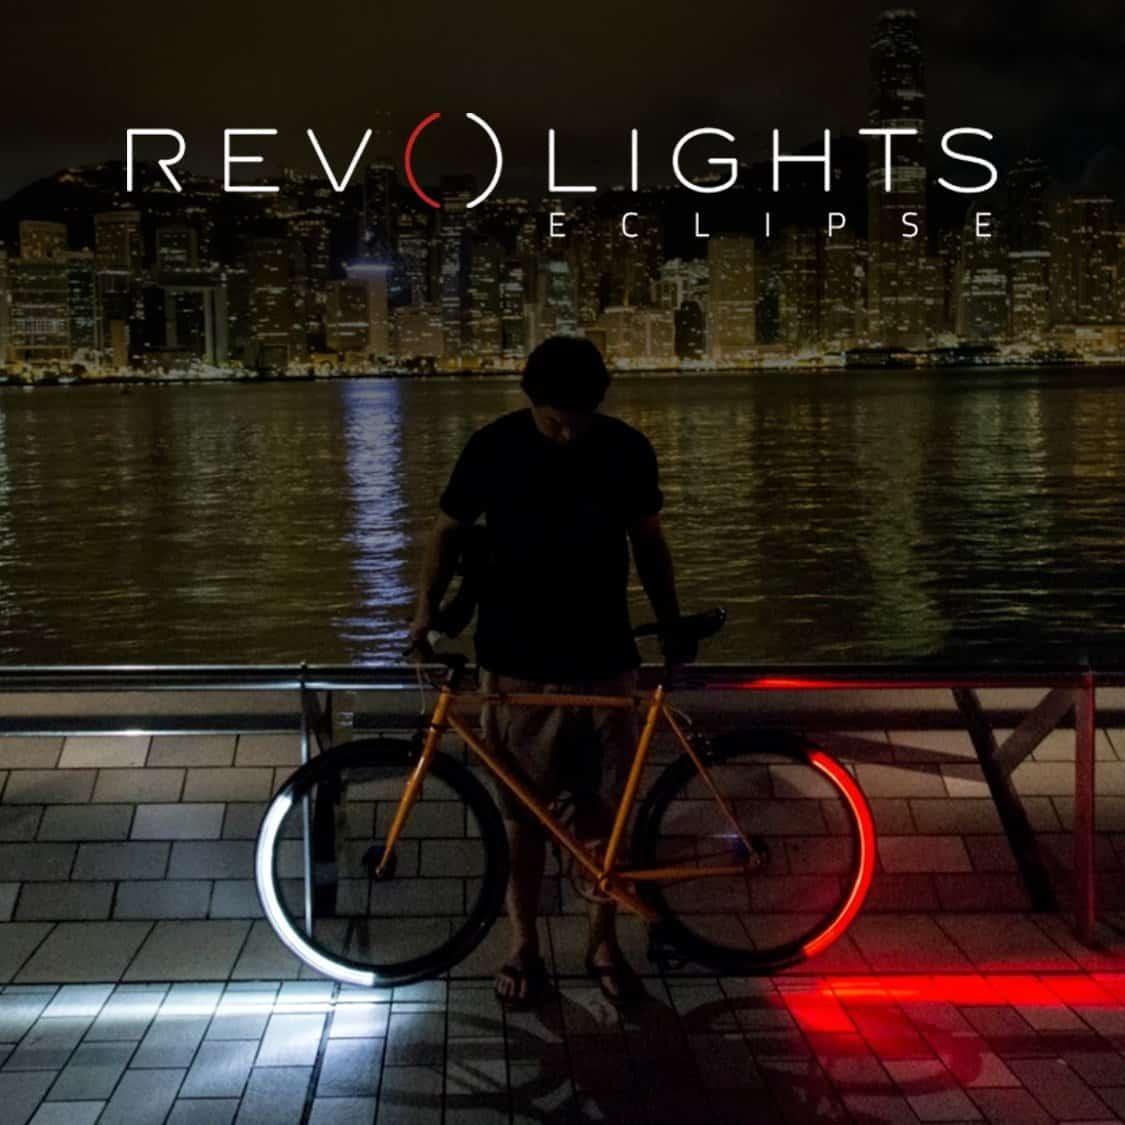 Sistema-De-Iluminação-Revolights-Eclipse-Bicycle-Lighting-System-700c27-Inch